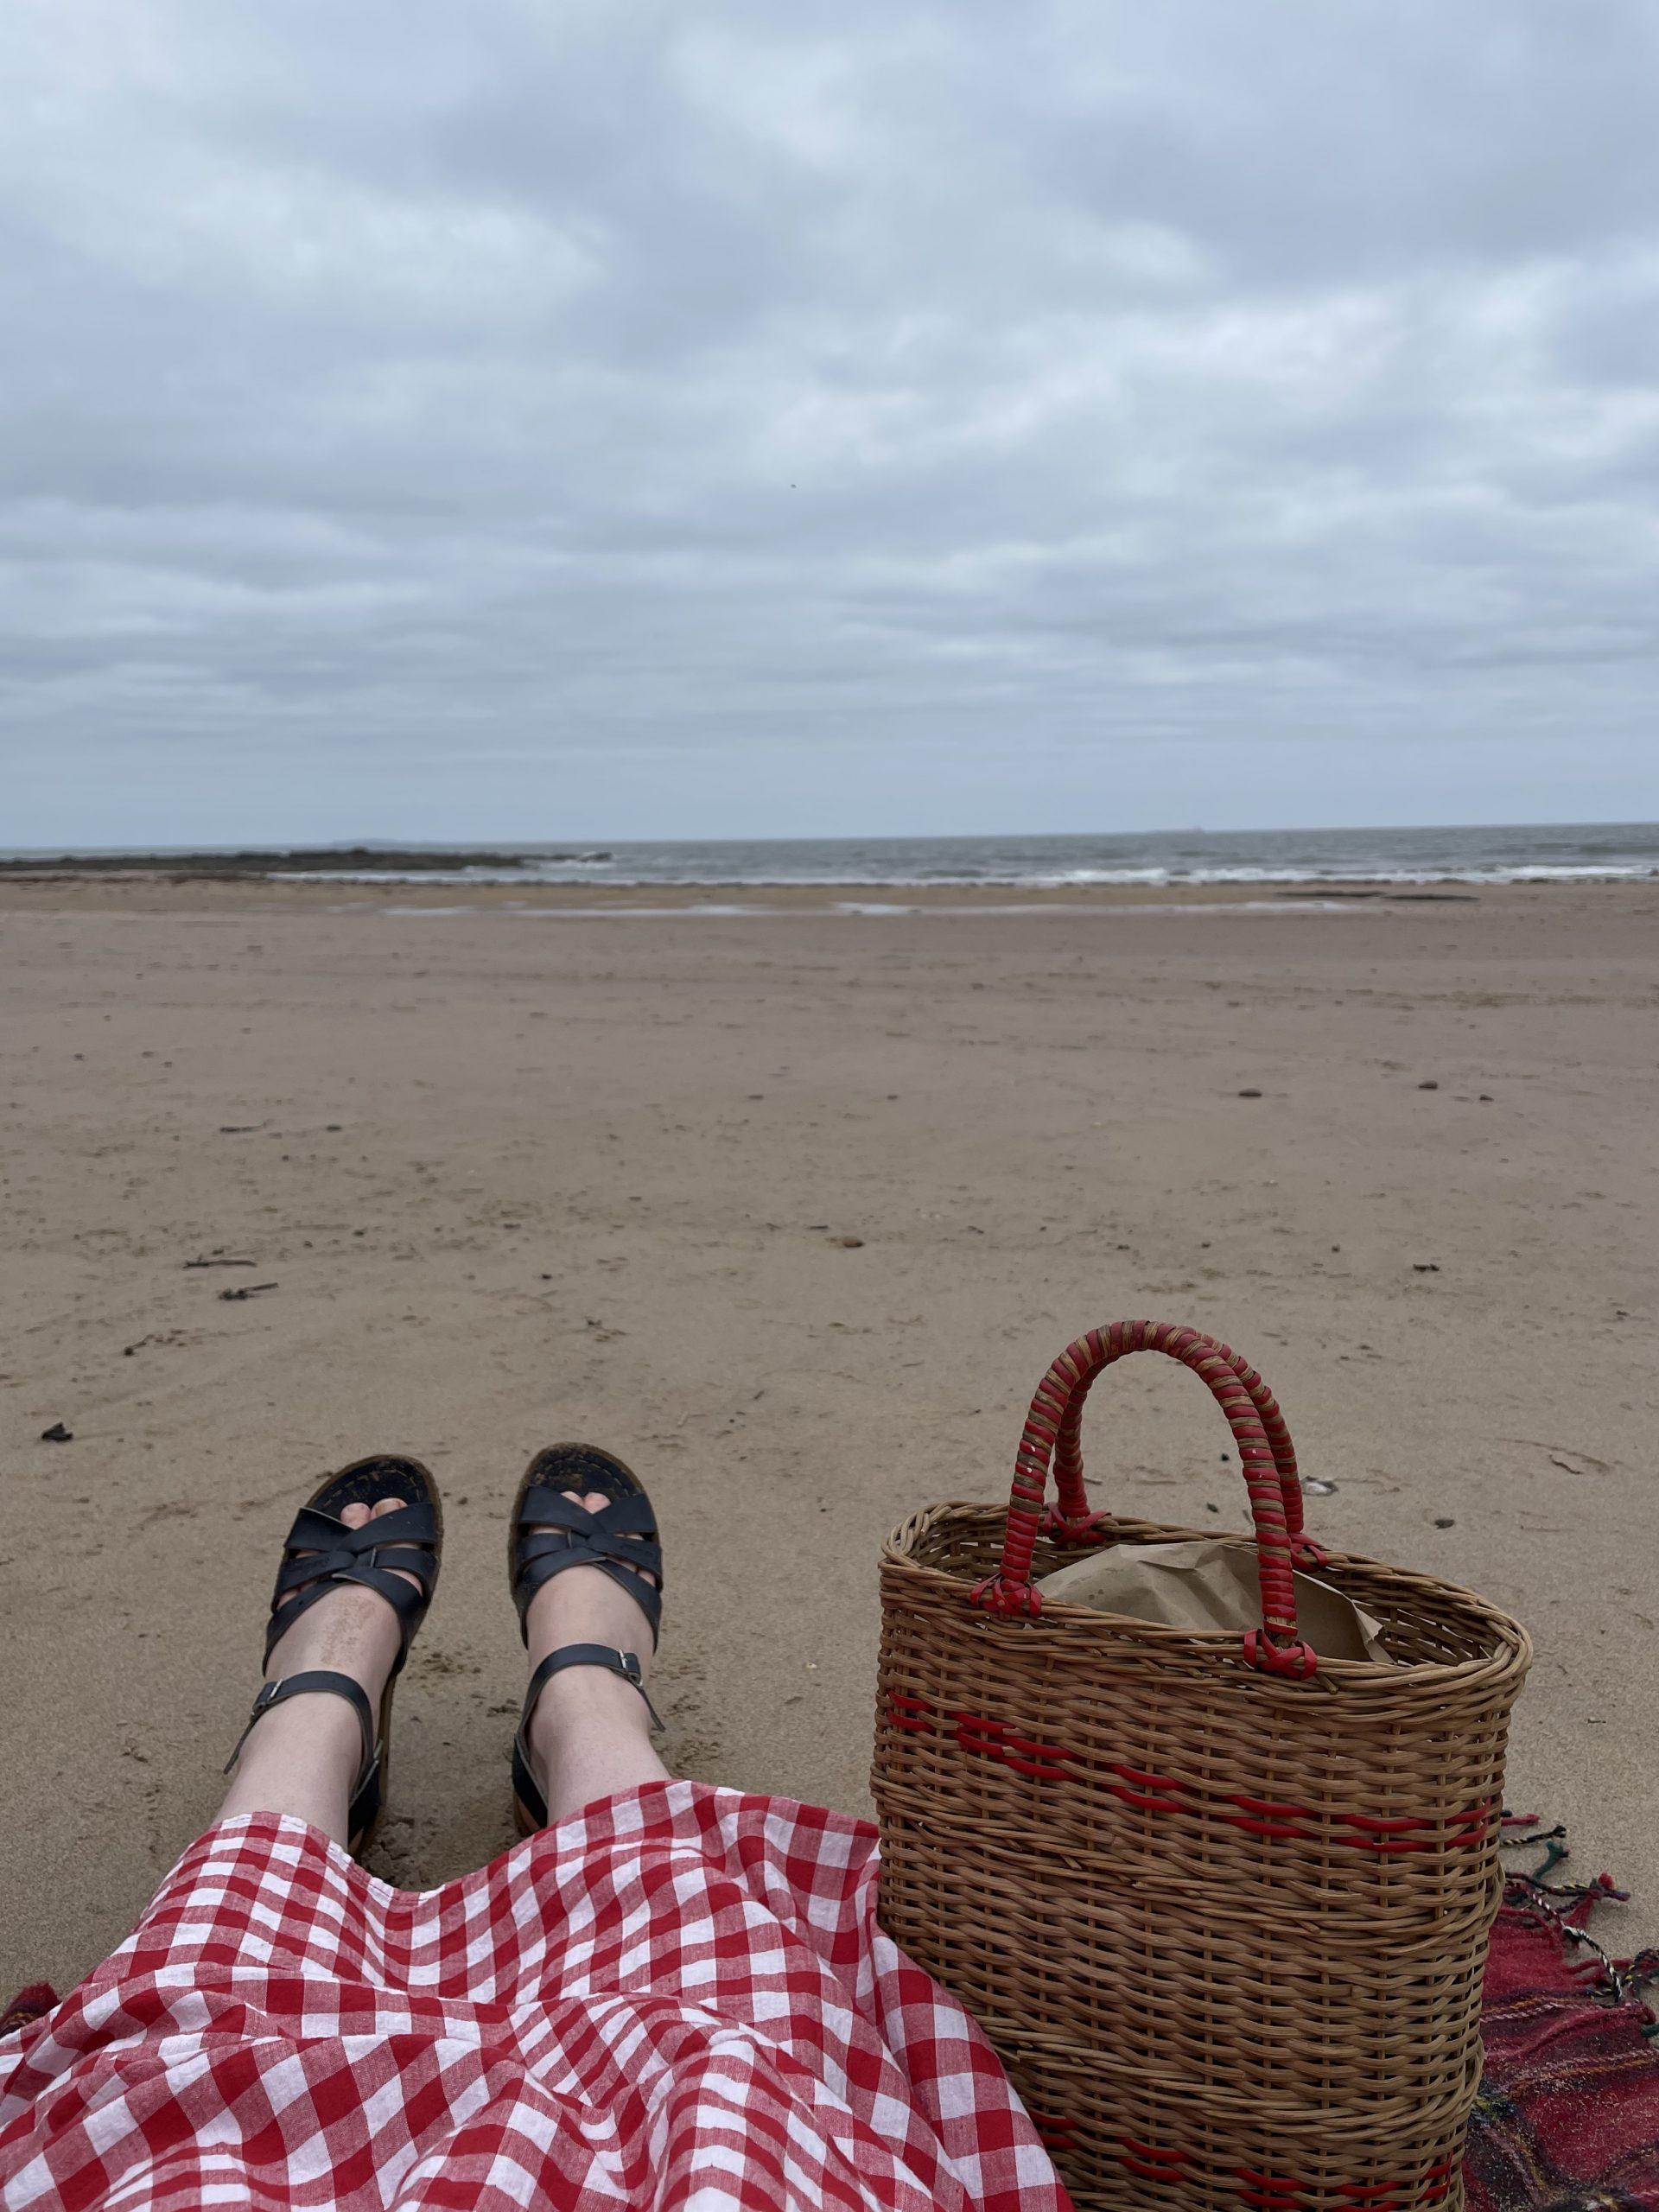 Vintage Basket at the Beach